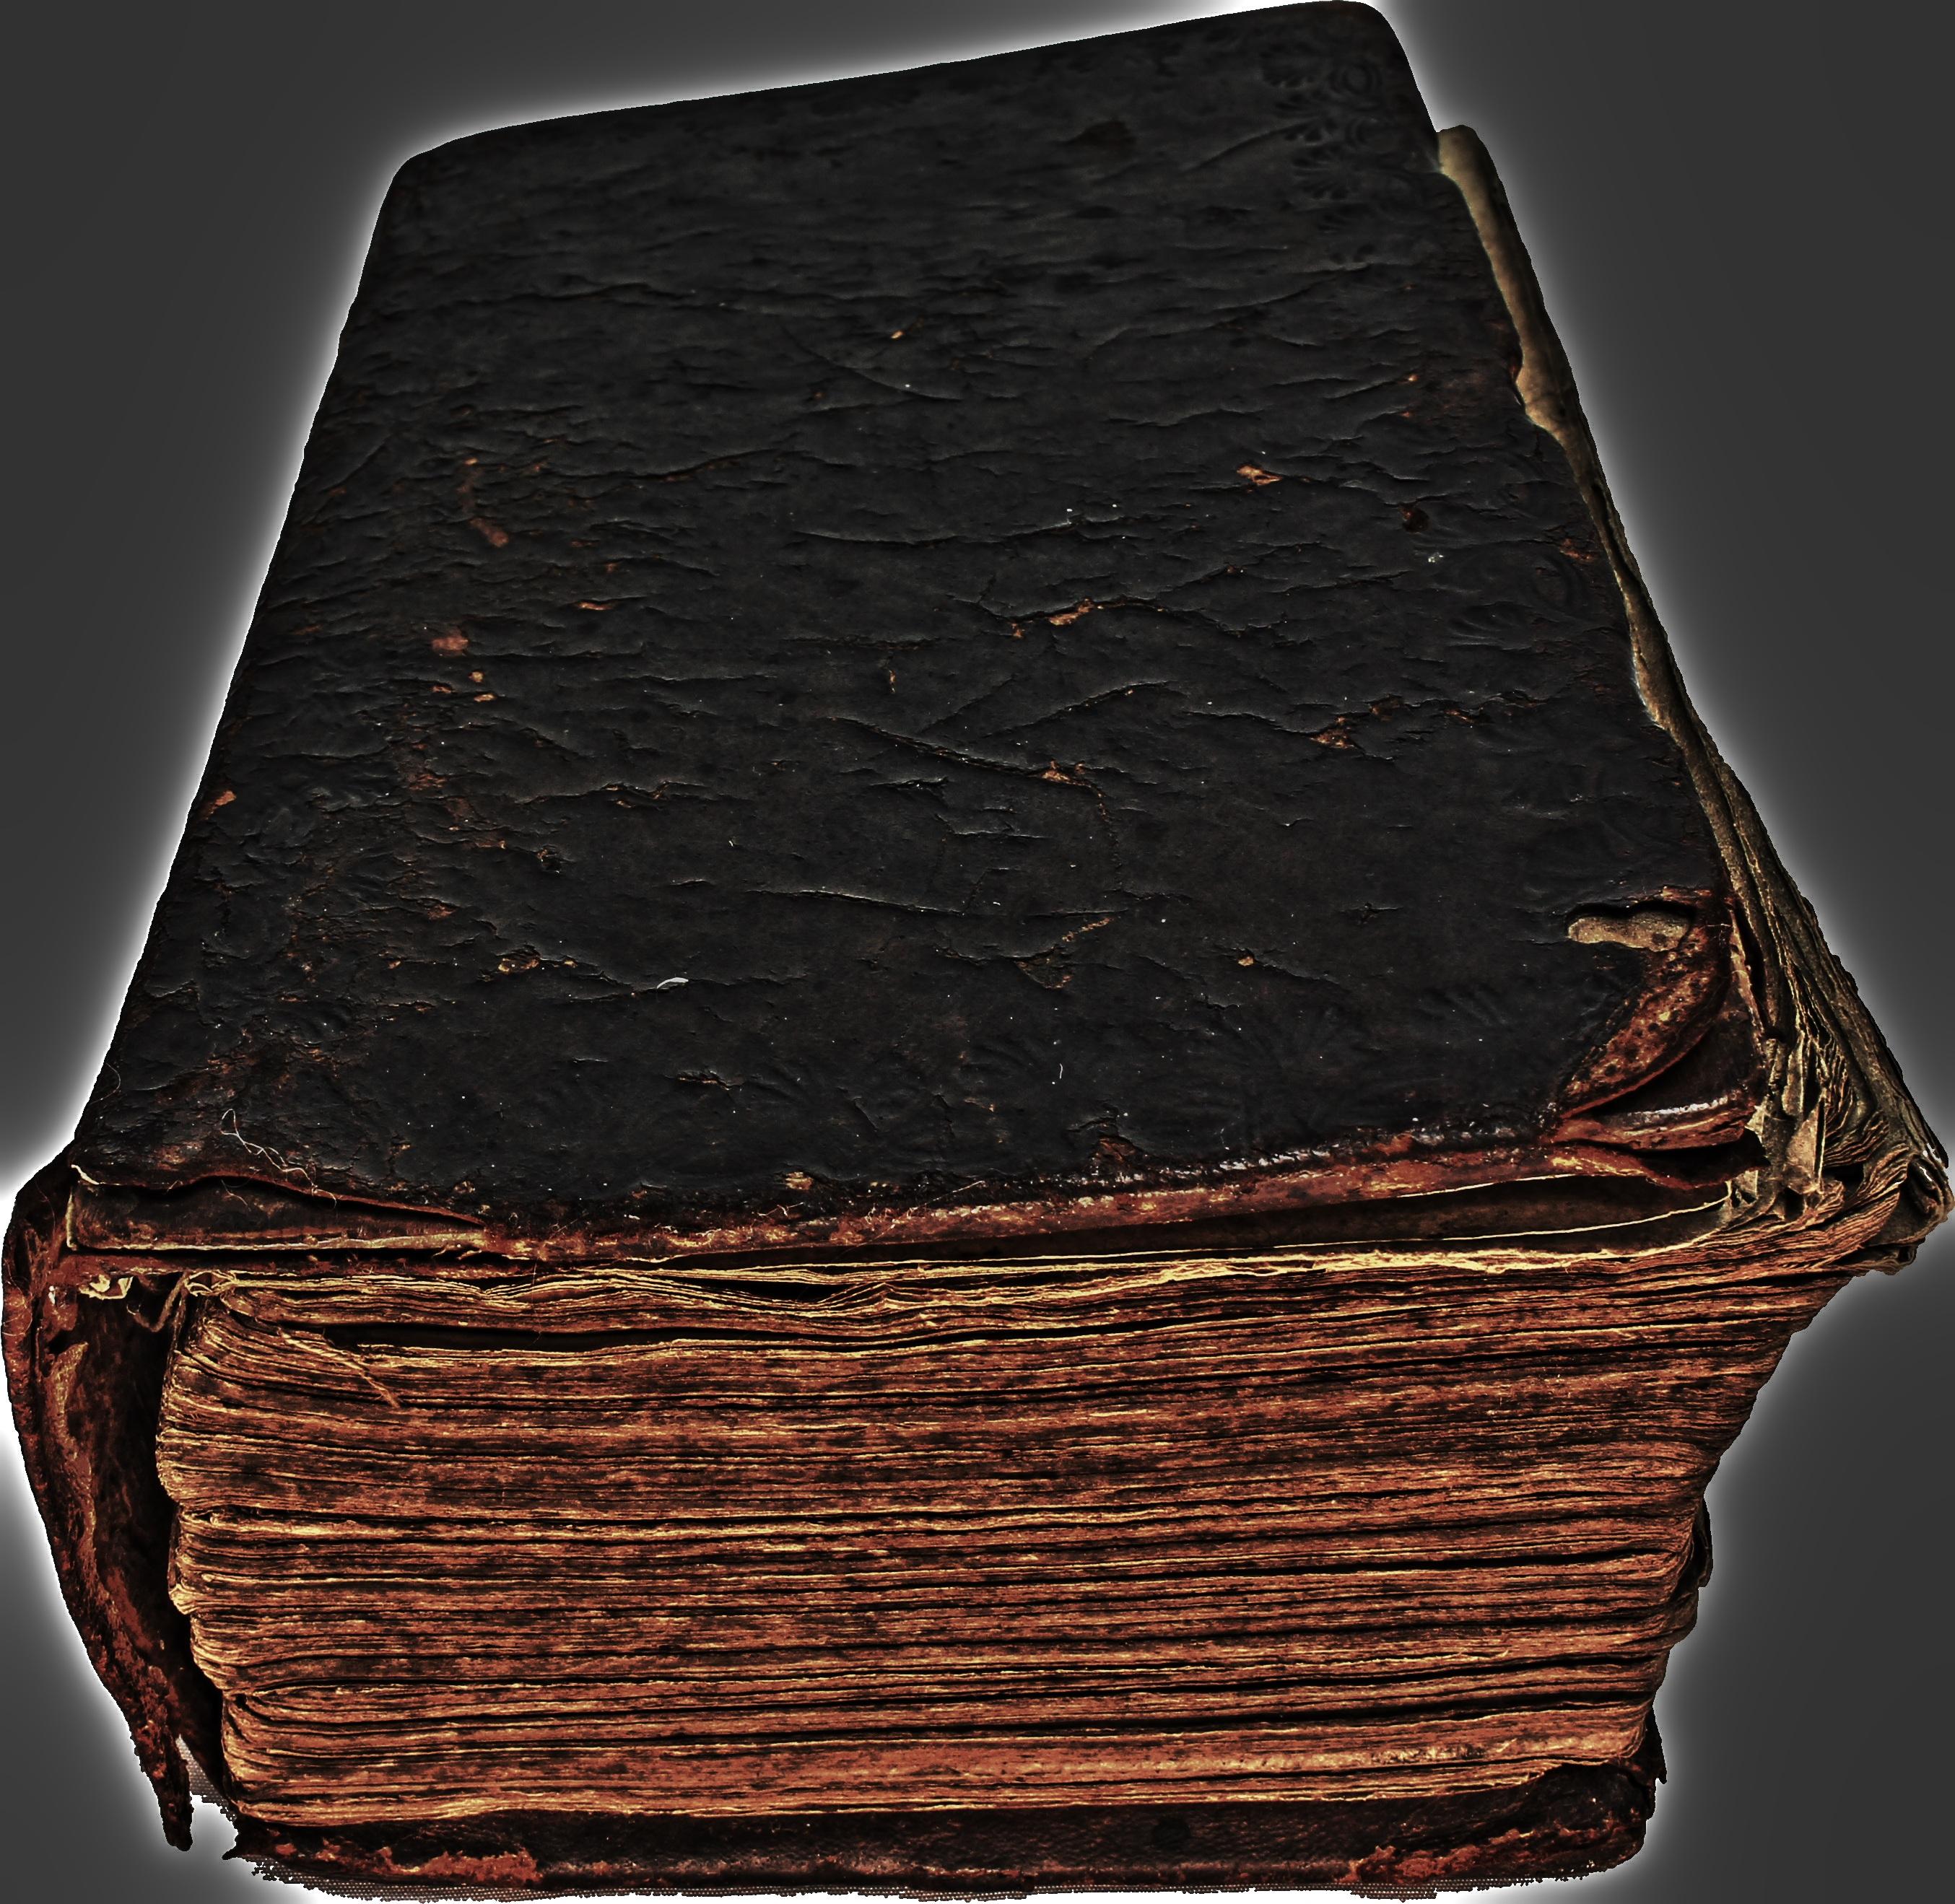 картинка древней библии карту